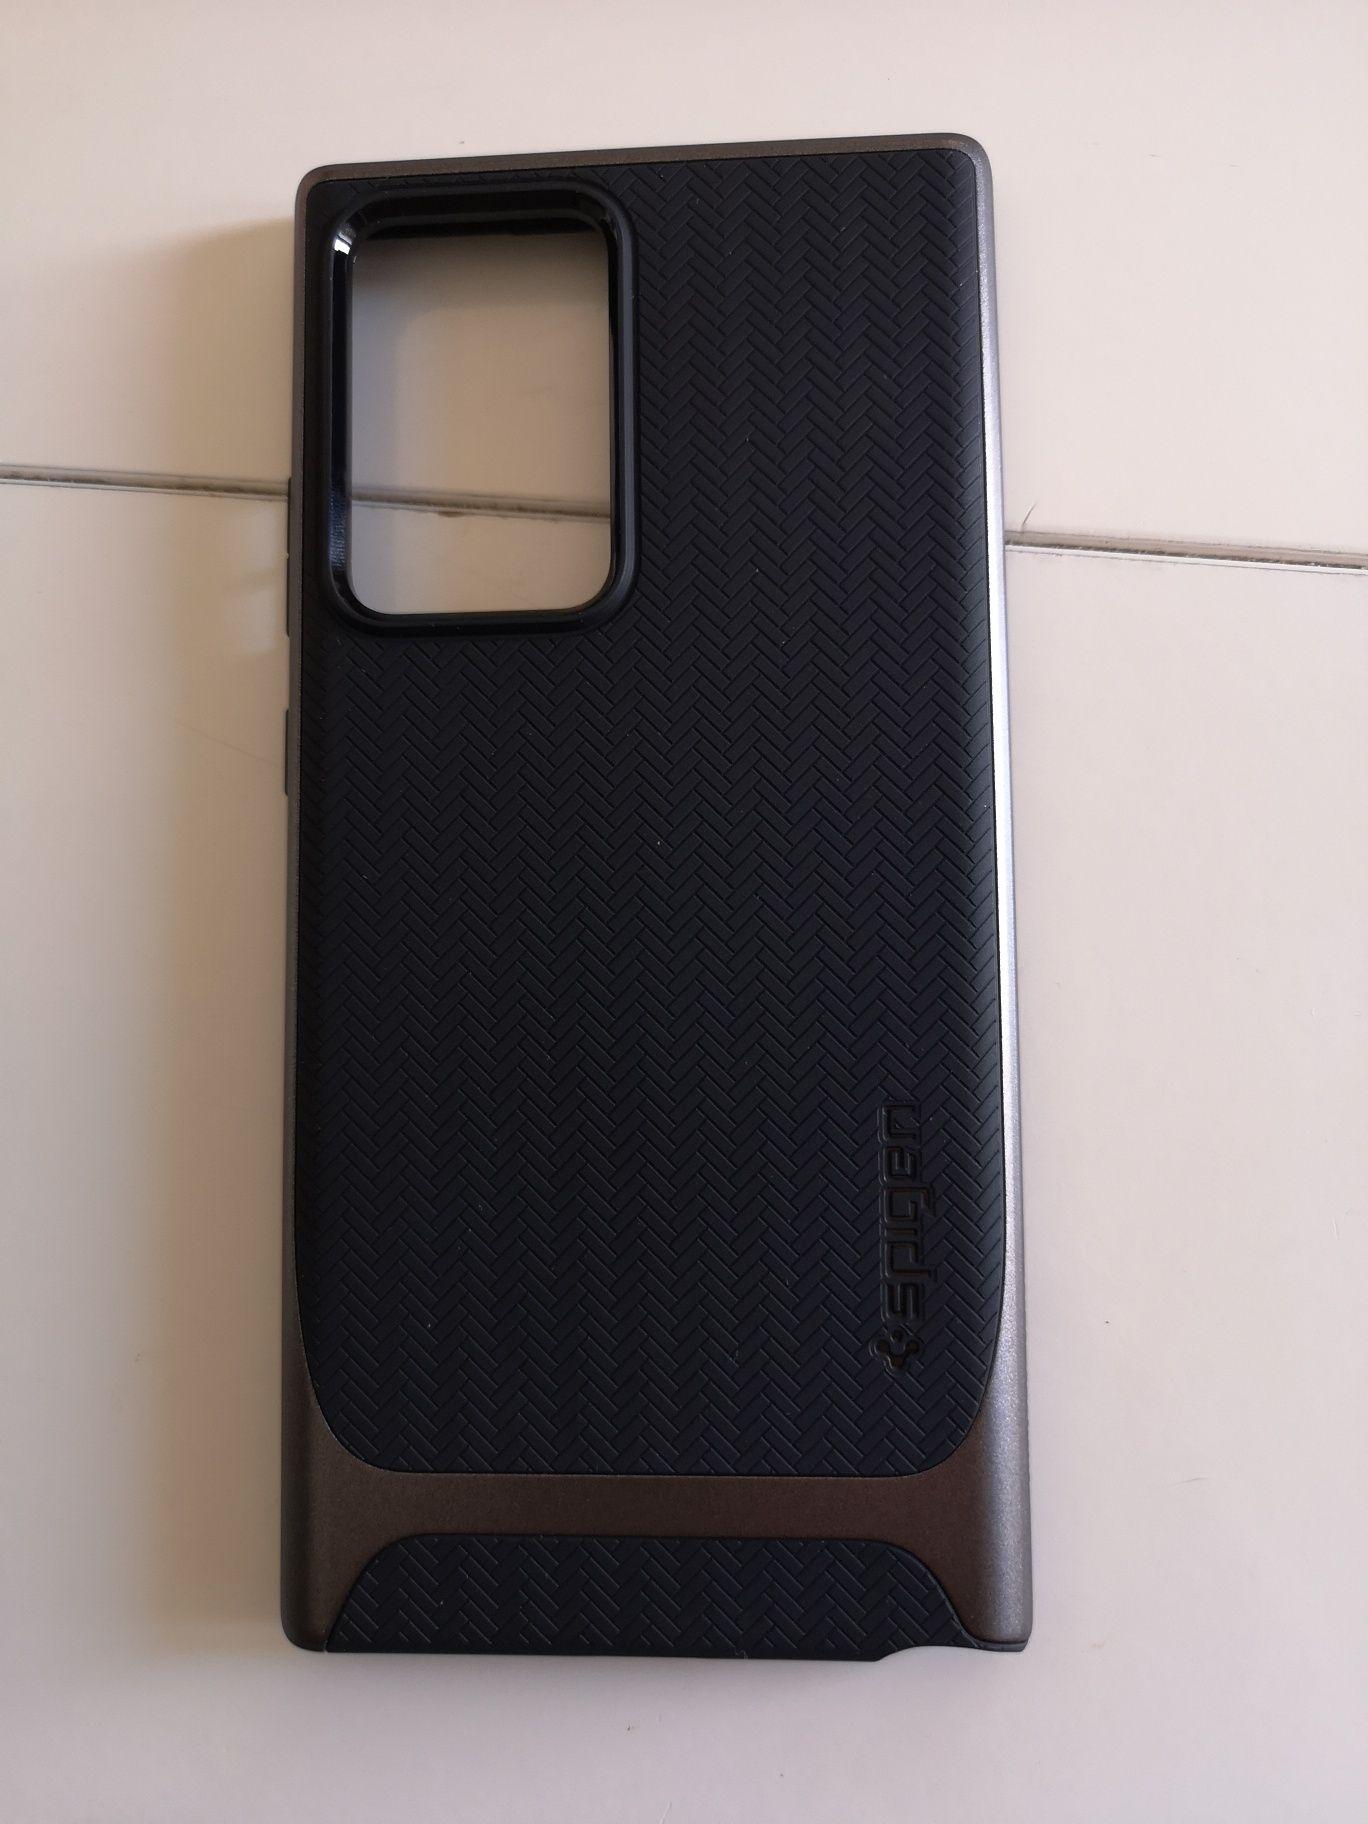 Capa spigen Neo Hybrid note 20 ultra